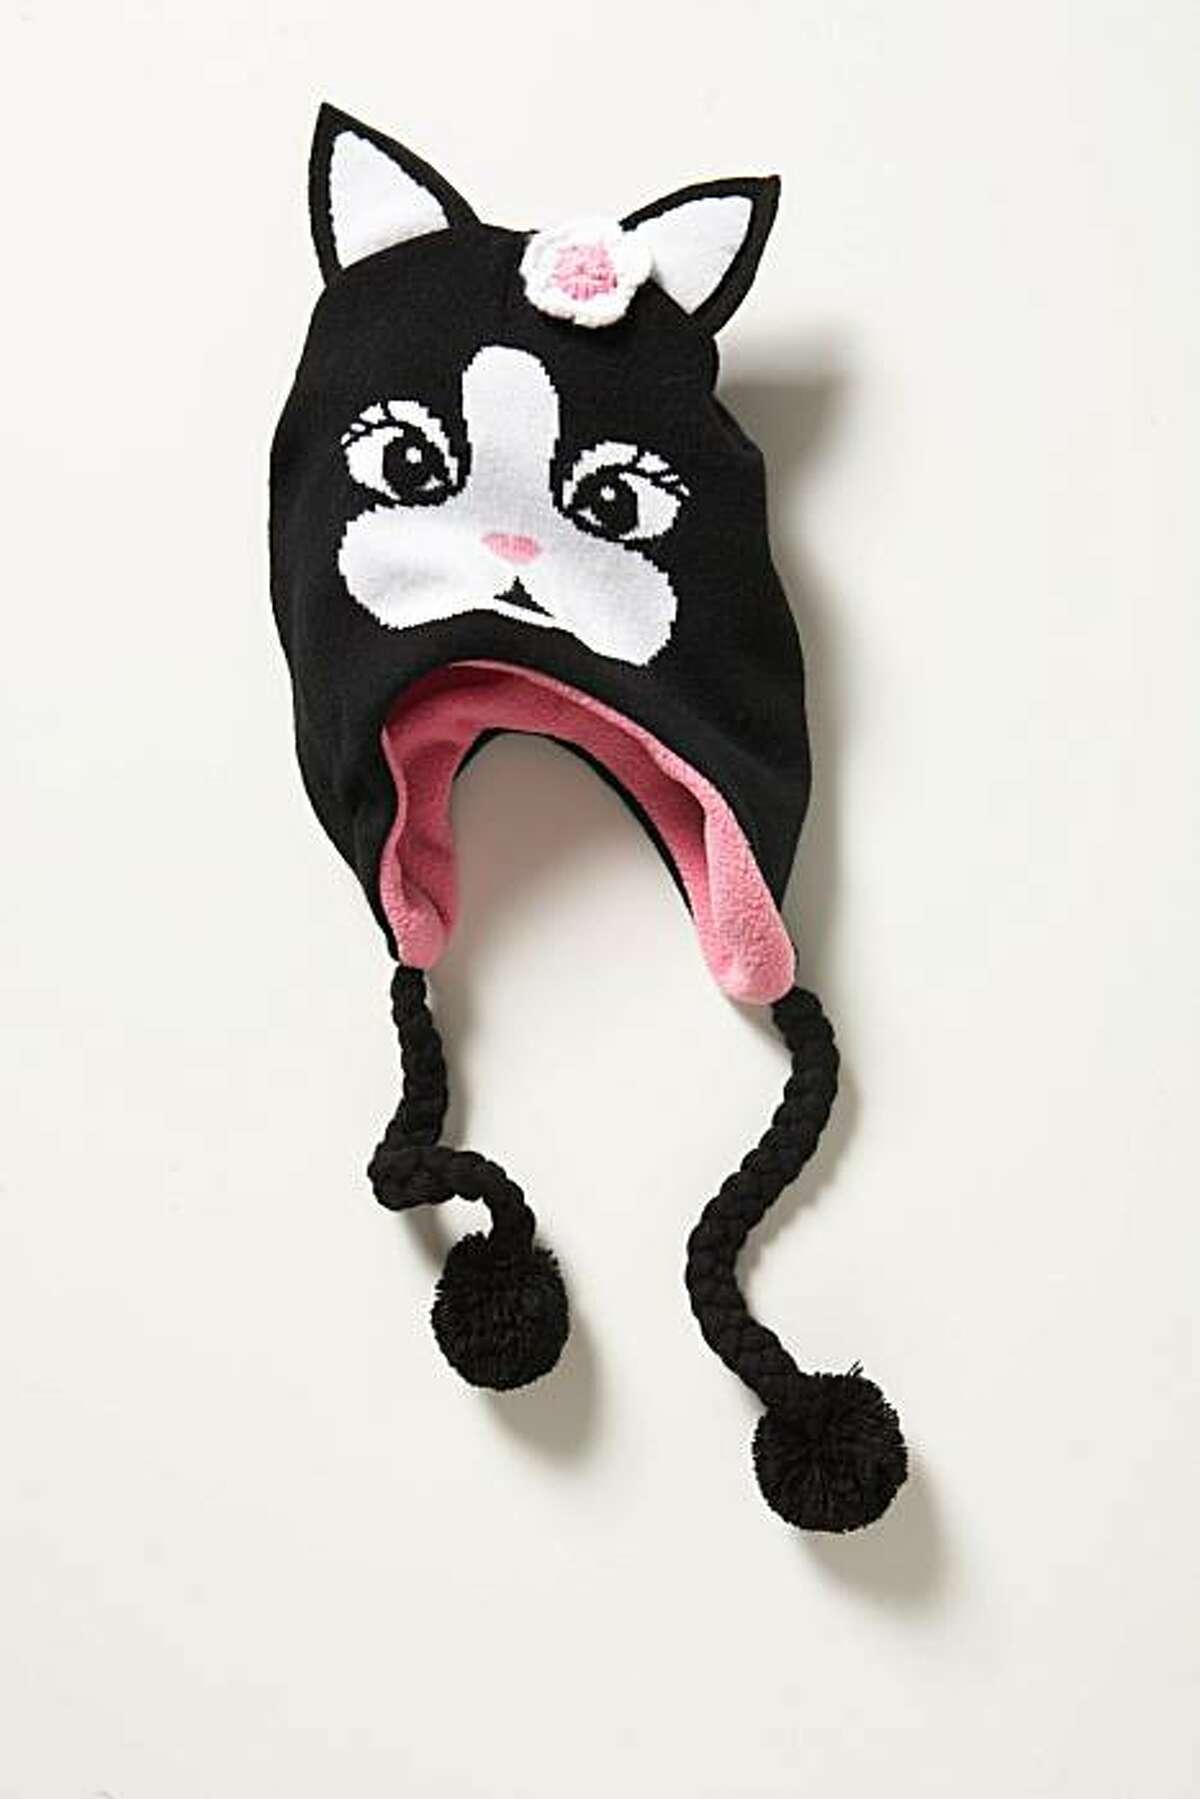 The Rebecca Bonbon cotton ear muff hat with dog ears ($6).